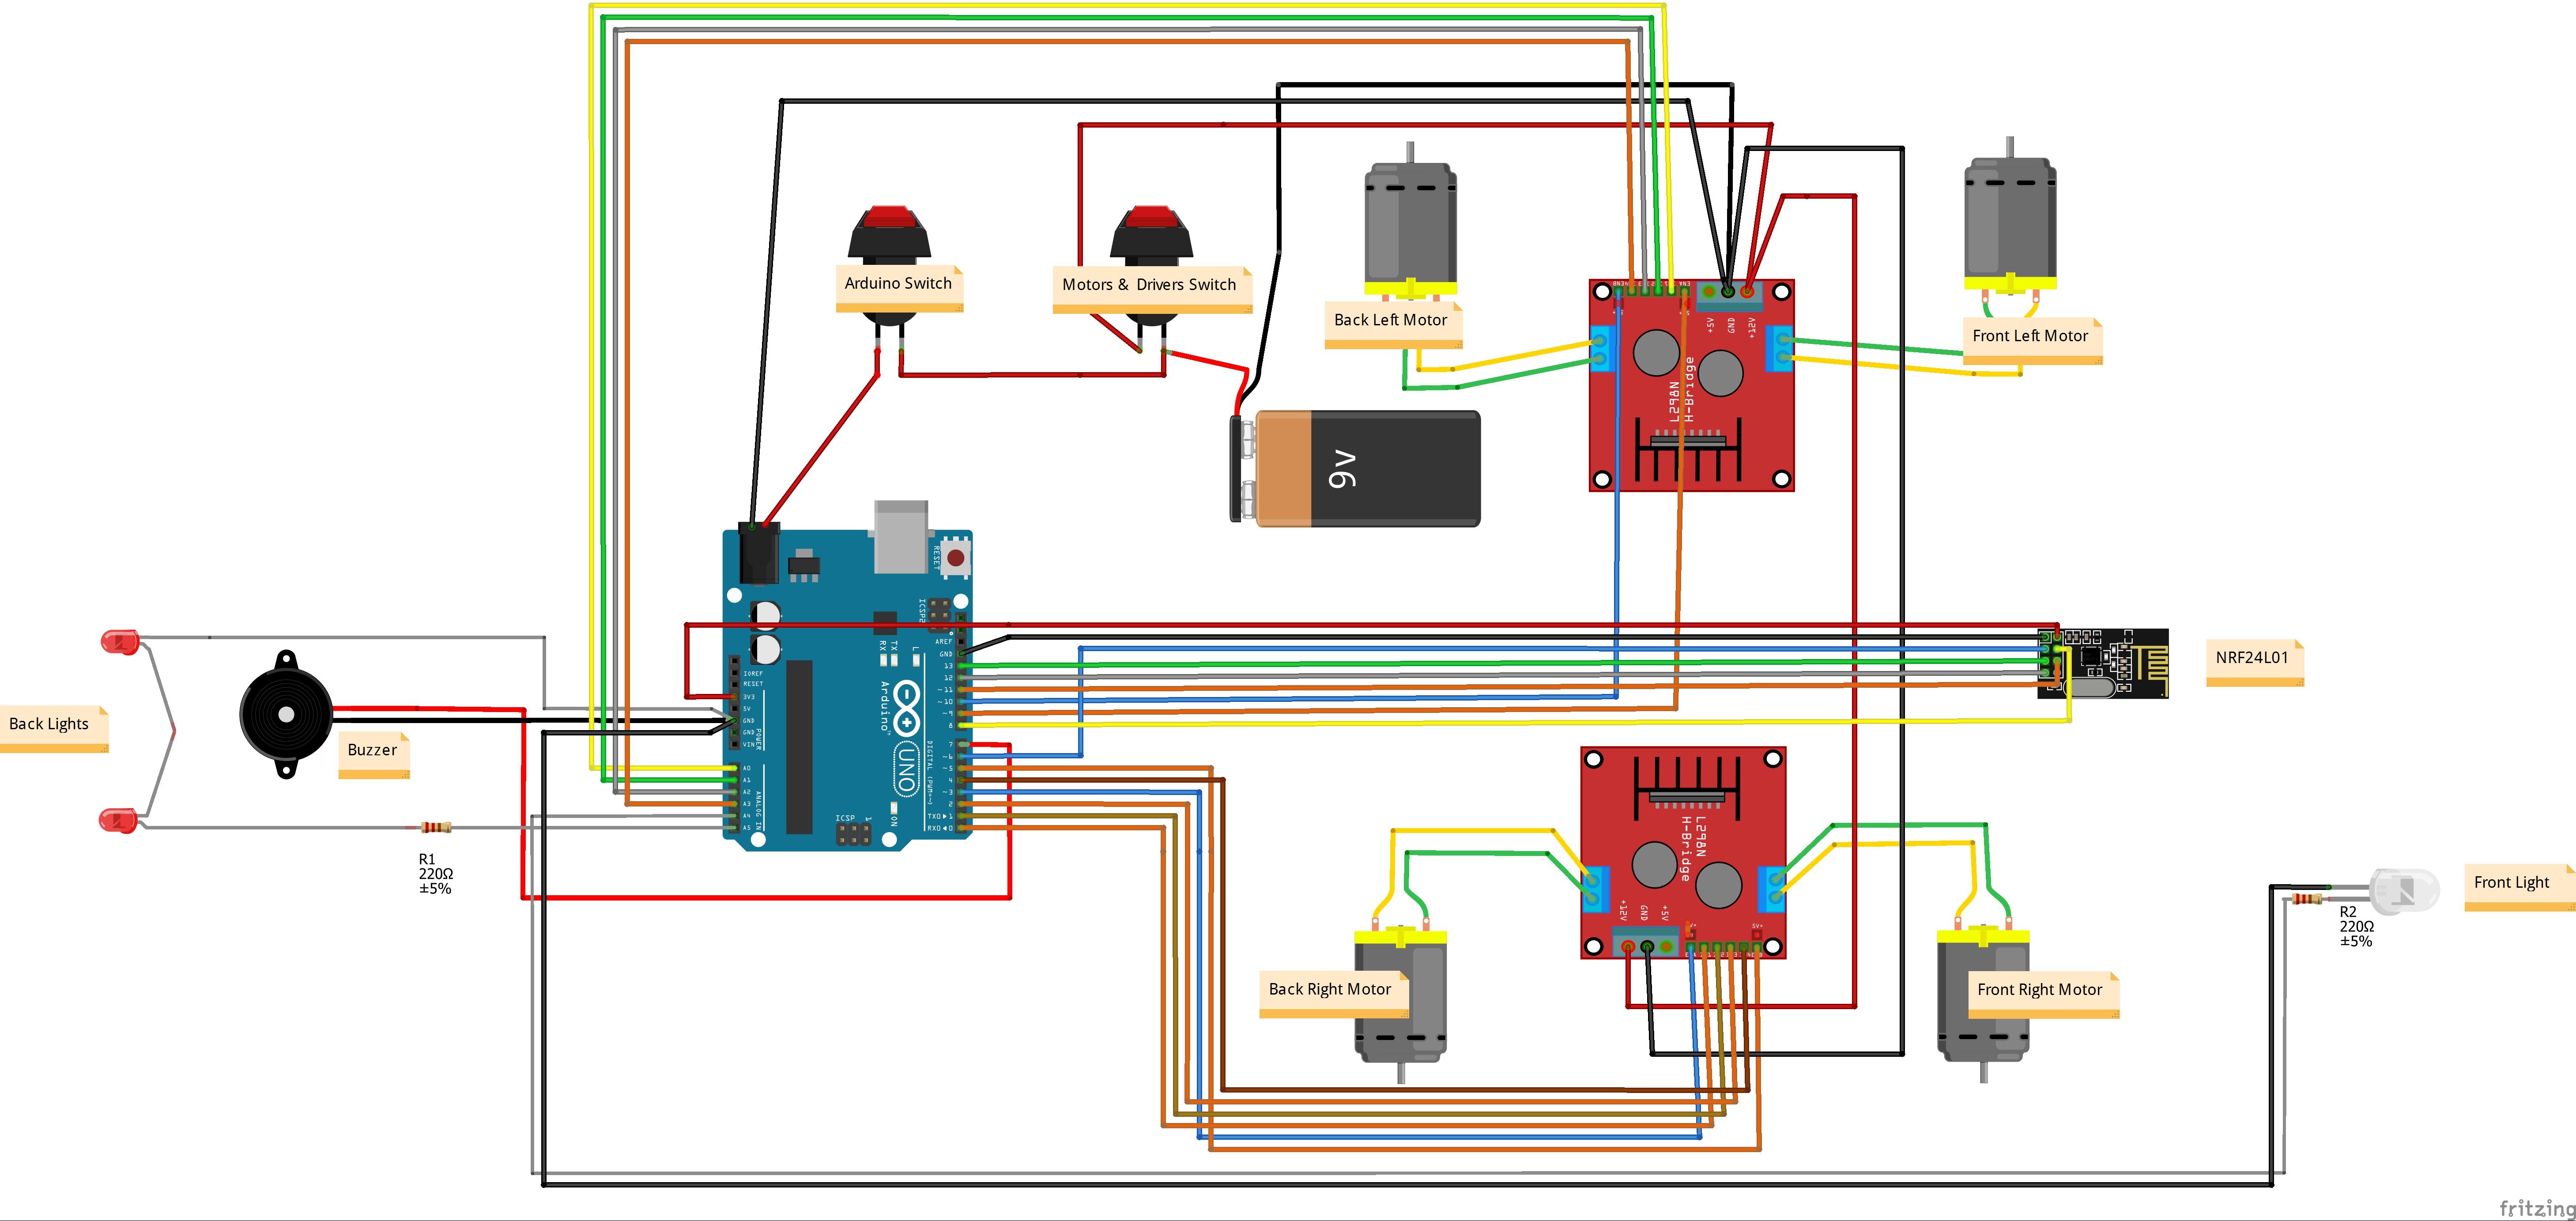 Wiring Diagram Ge Washer Whre5550k1ww